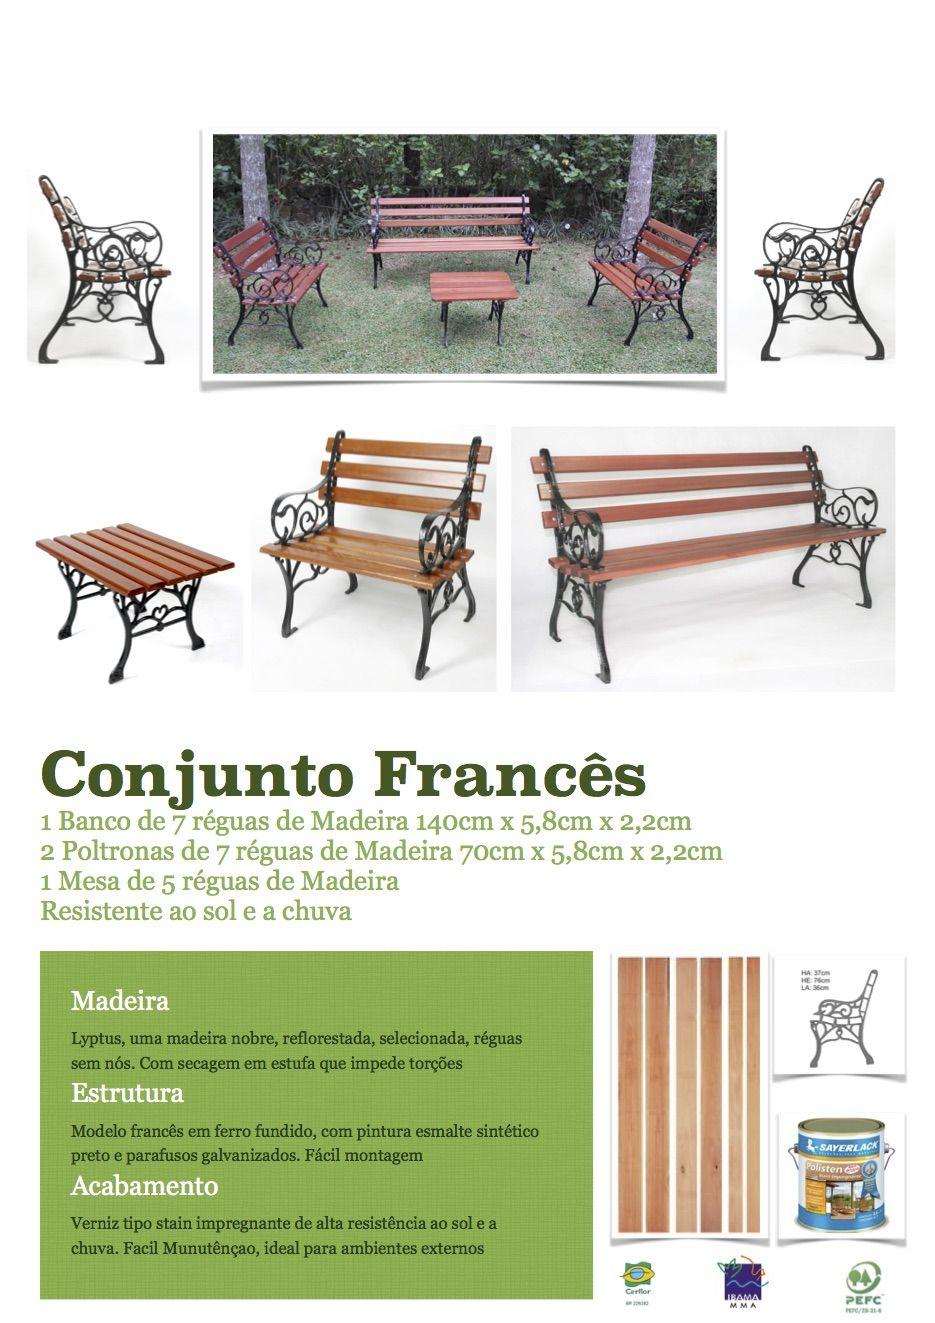 Conjunto Frances Jardim Madeira Ferro Fundido 3 Banco 1 Mesa R